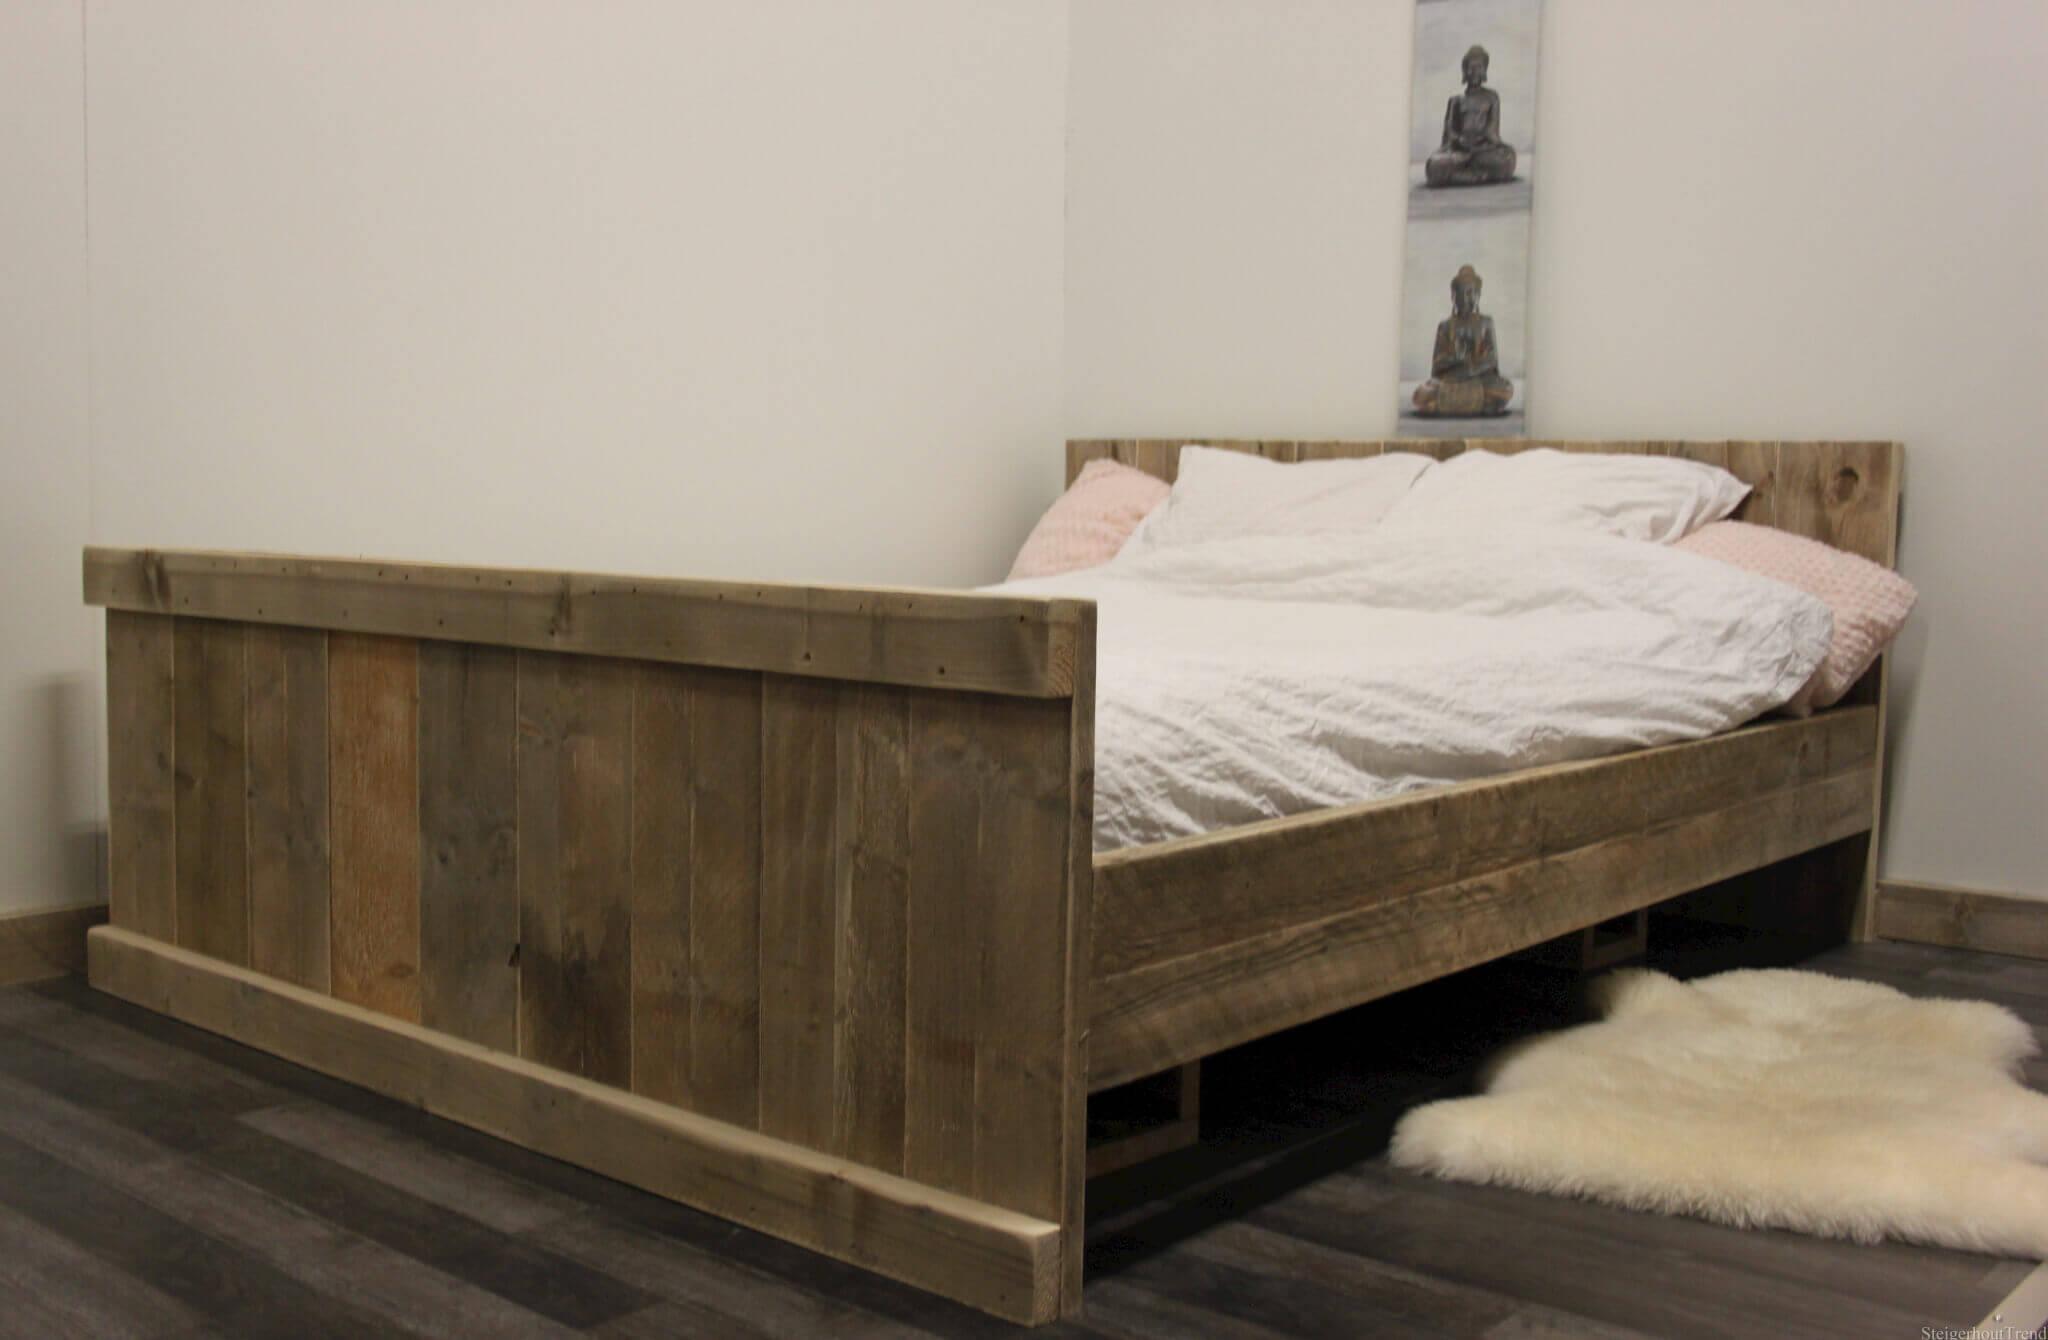 Steigerhouten bed tulsa steigerhouttrend for Bed slaapkamer